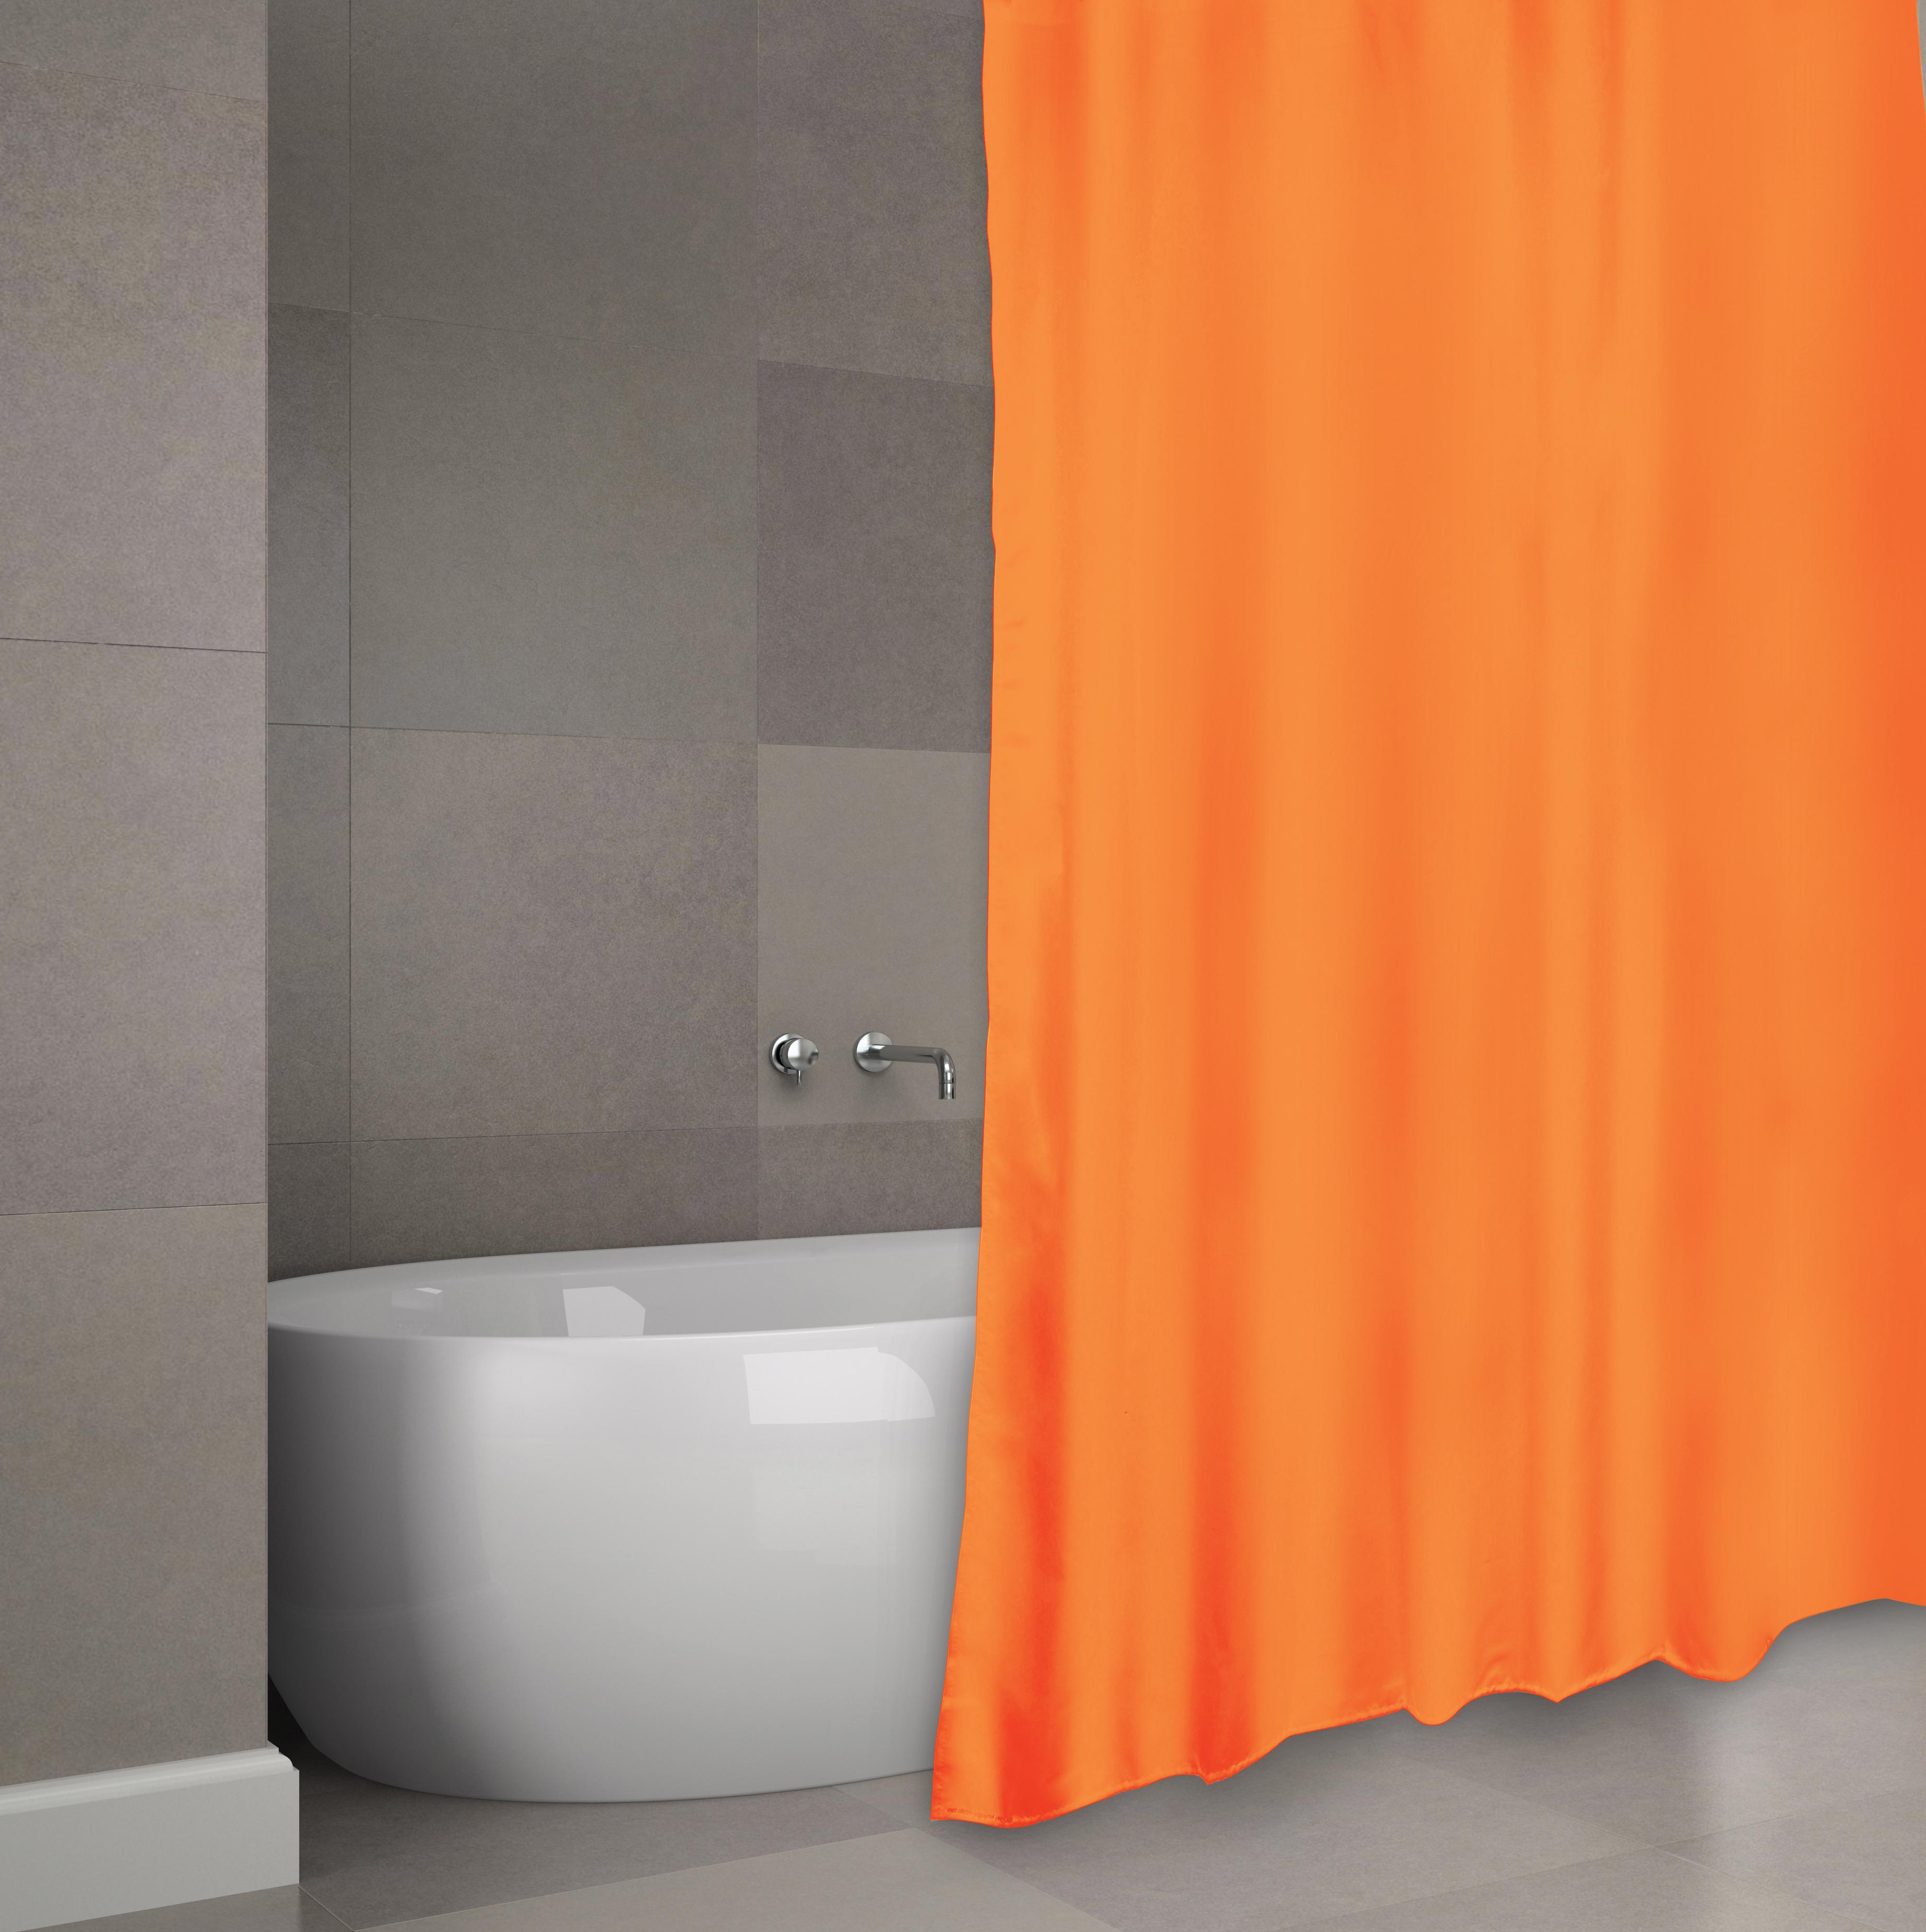 MSV Duschvorhang 180x200cm Anti Schimmel Textil Badewannenvorhang Wannenvorhang Orange